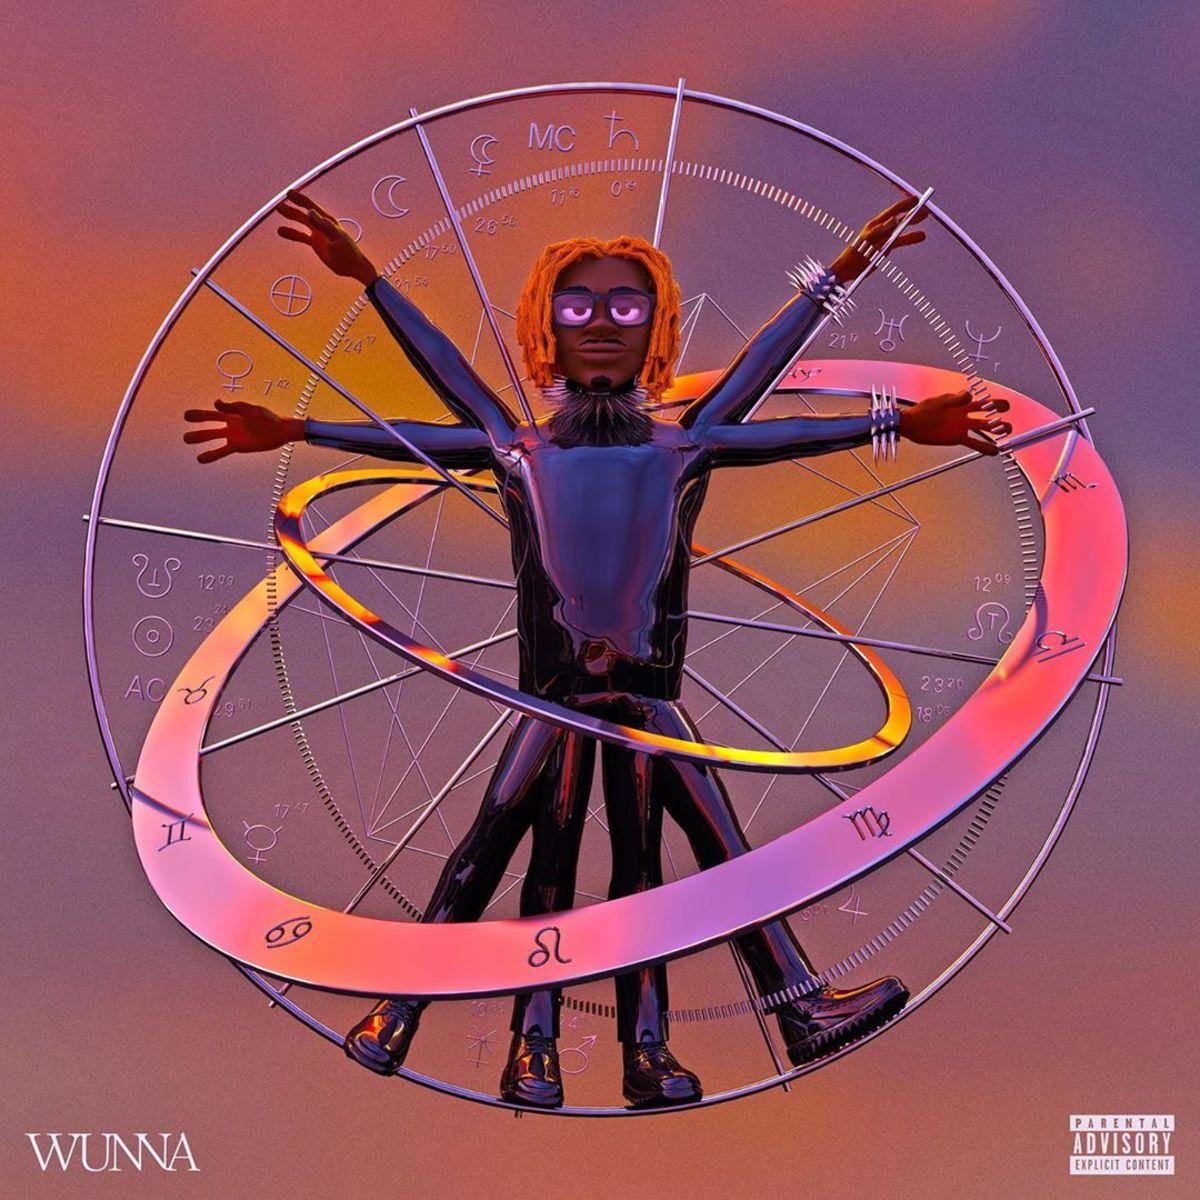 Gunna Reveals Tracklist And Cover Art For New Album Wunna Complex